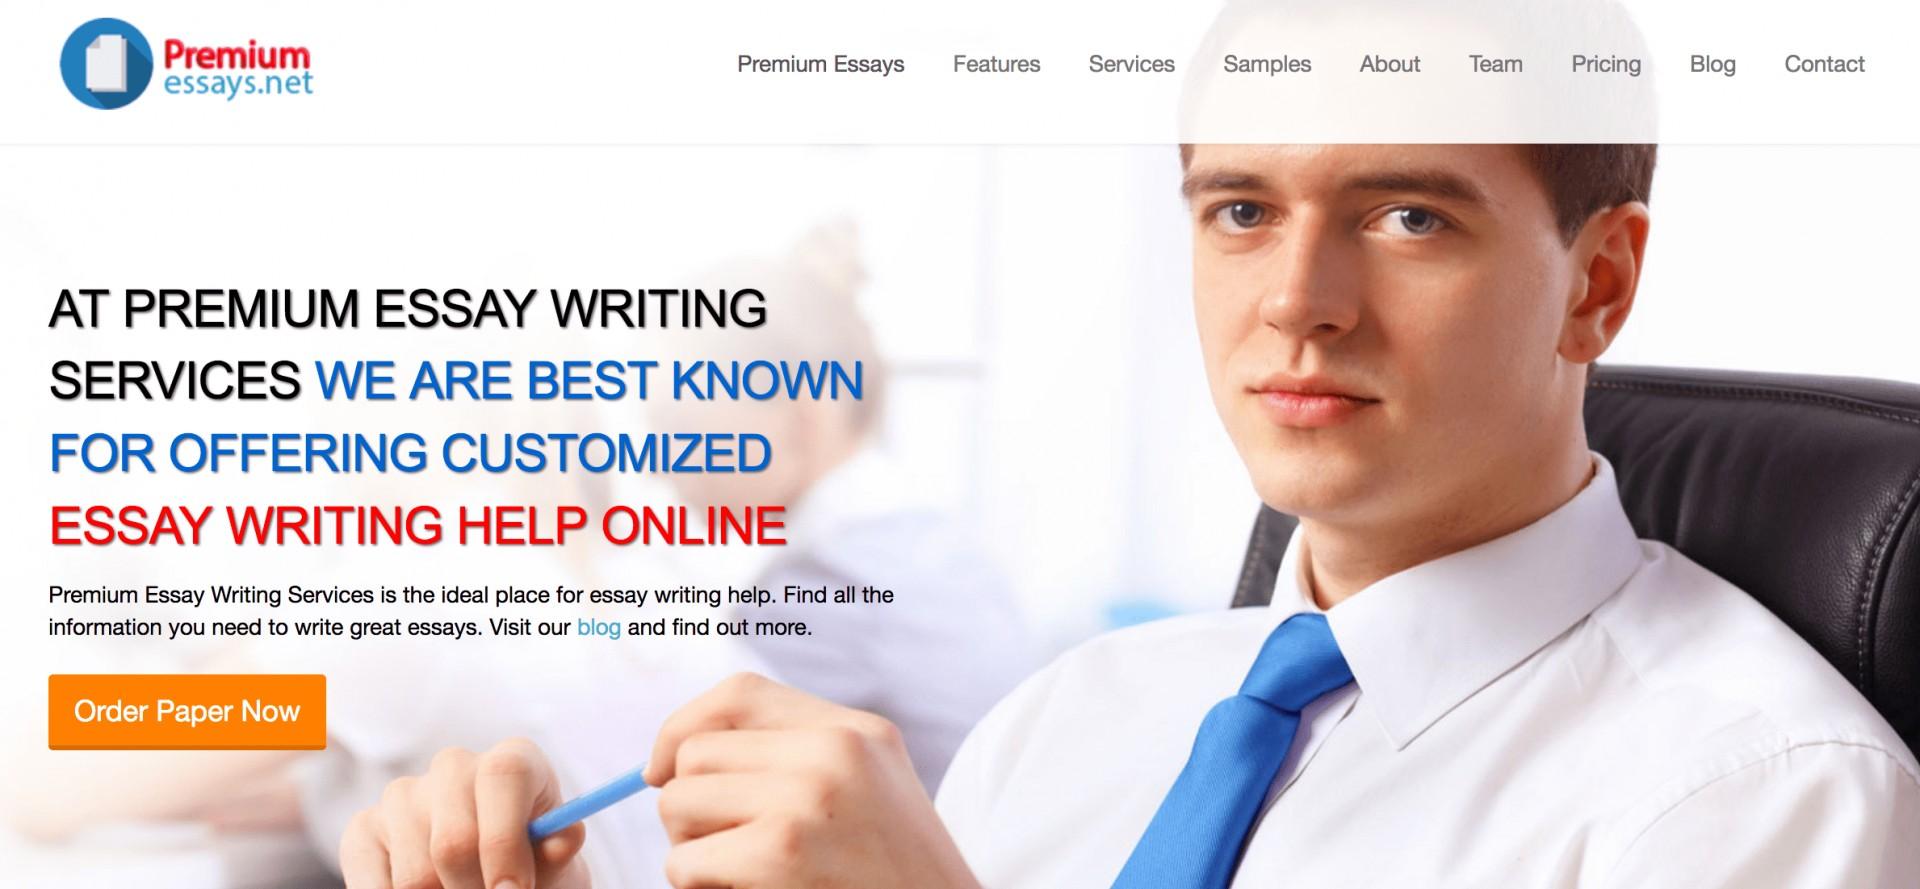 018 Essay Example 3752552280 Premium Writing Service Stupendous Services Online Professional Uk Good Reddit Admission Reviews 1920